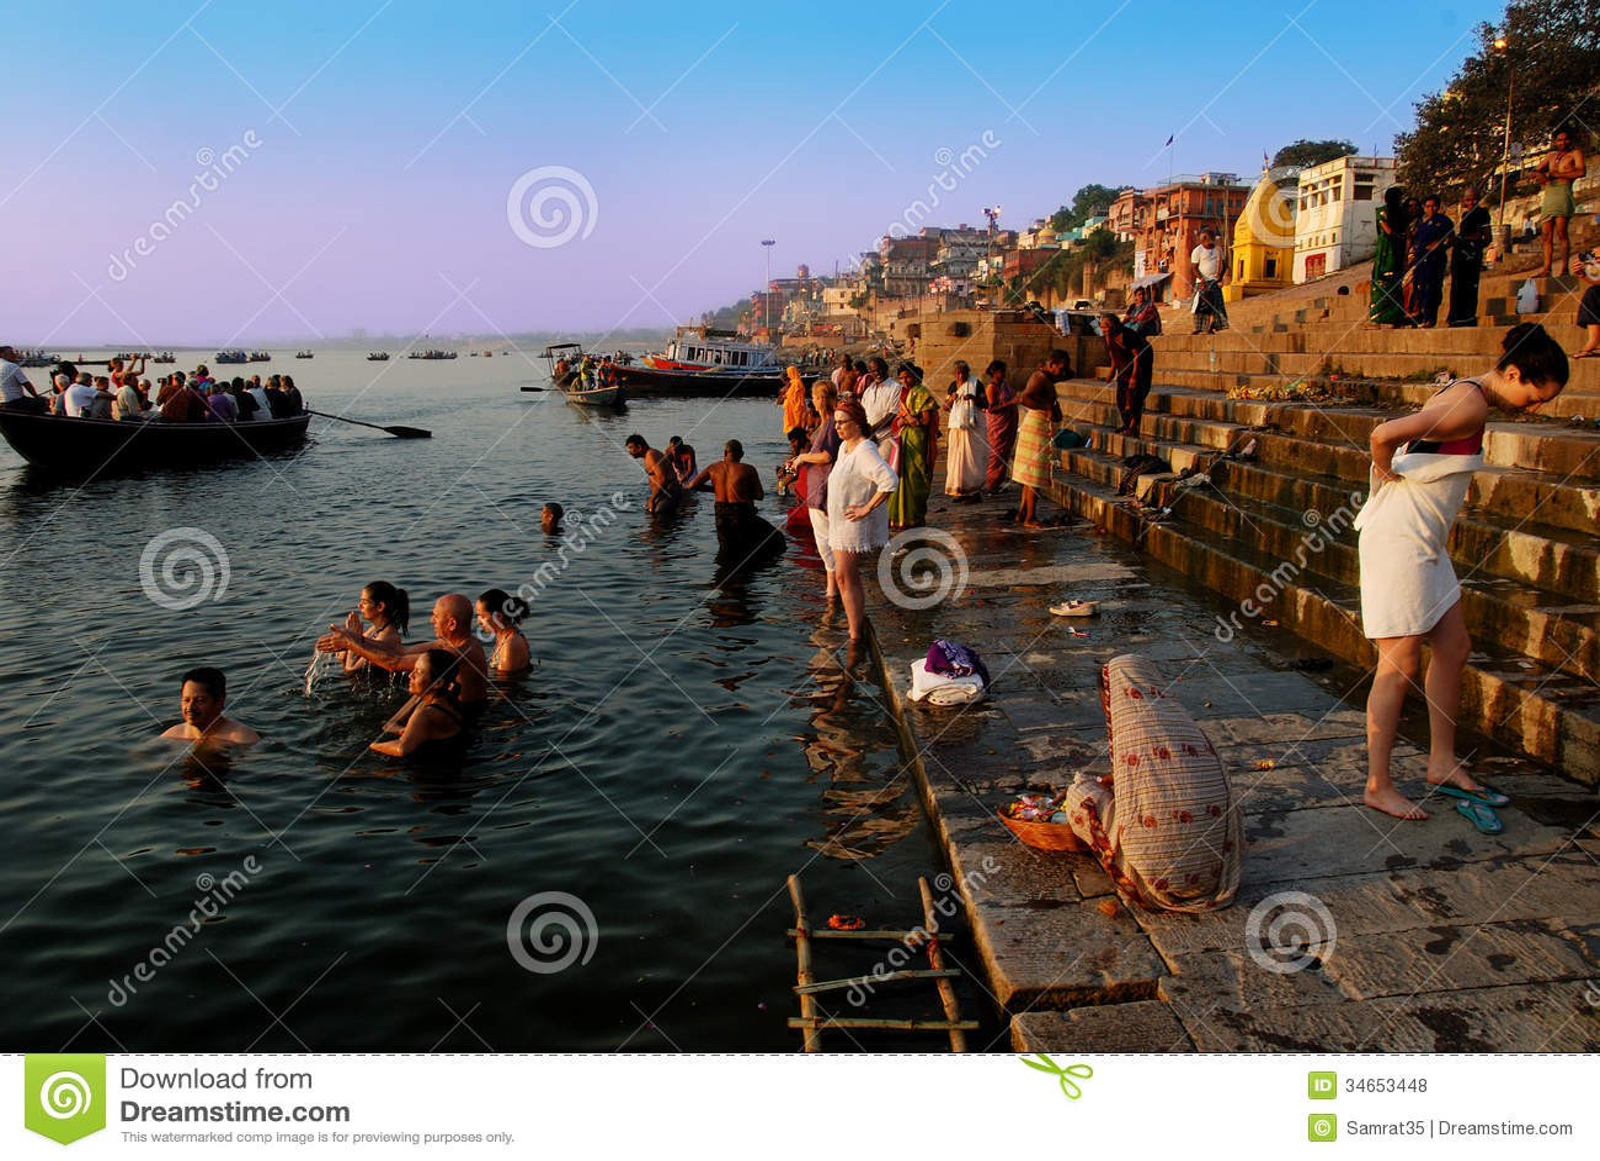 travel india editorial stock photo